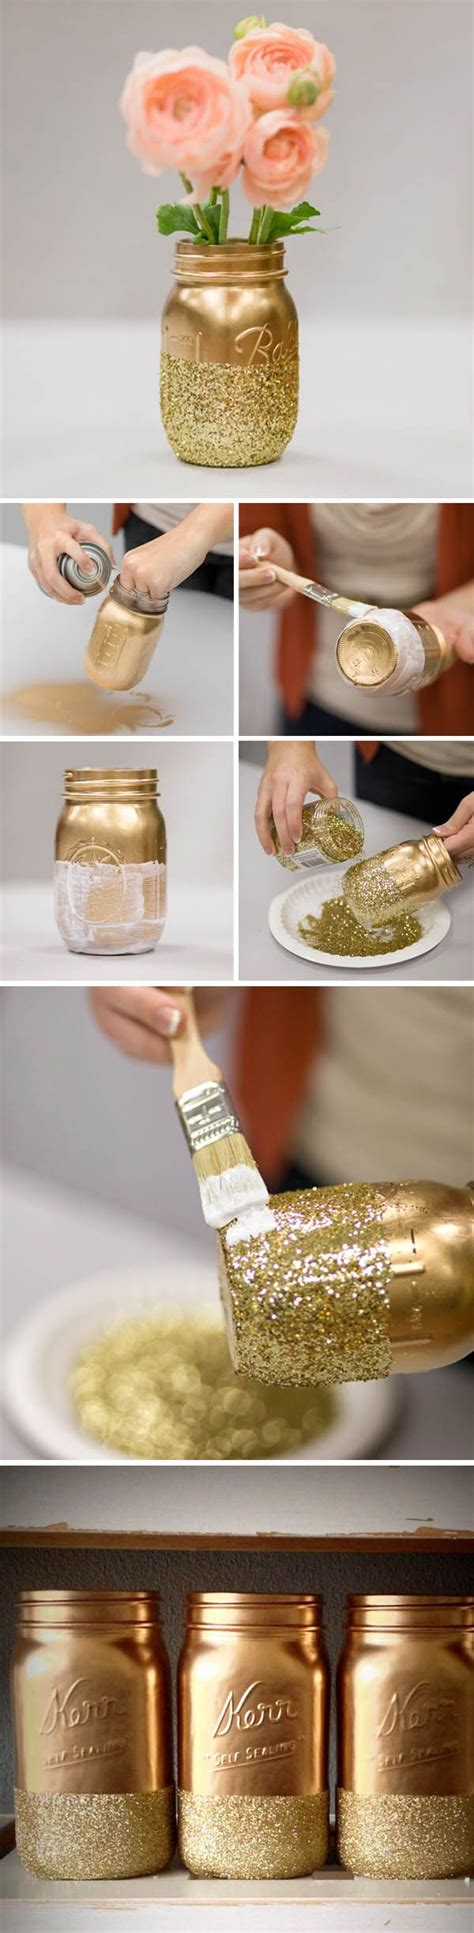 Jar Vases For Wedding by Ten Inspirational Diy Jar Ideas For Weddings Gold Jars Jar Vases And Jar